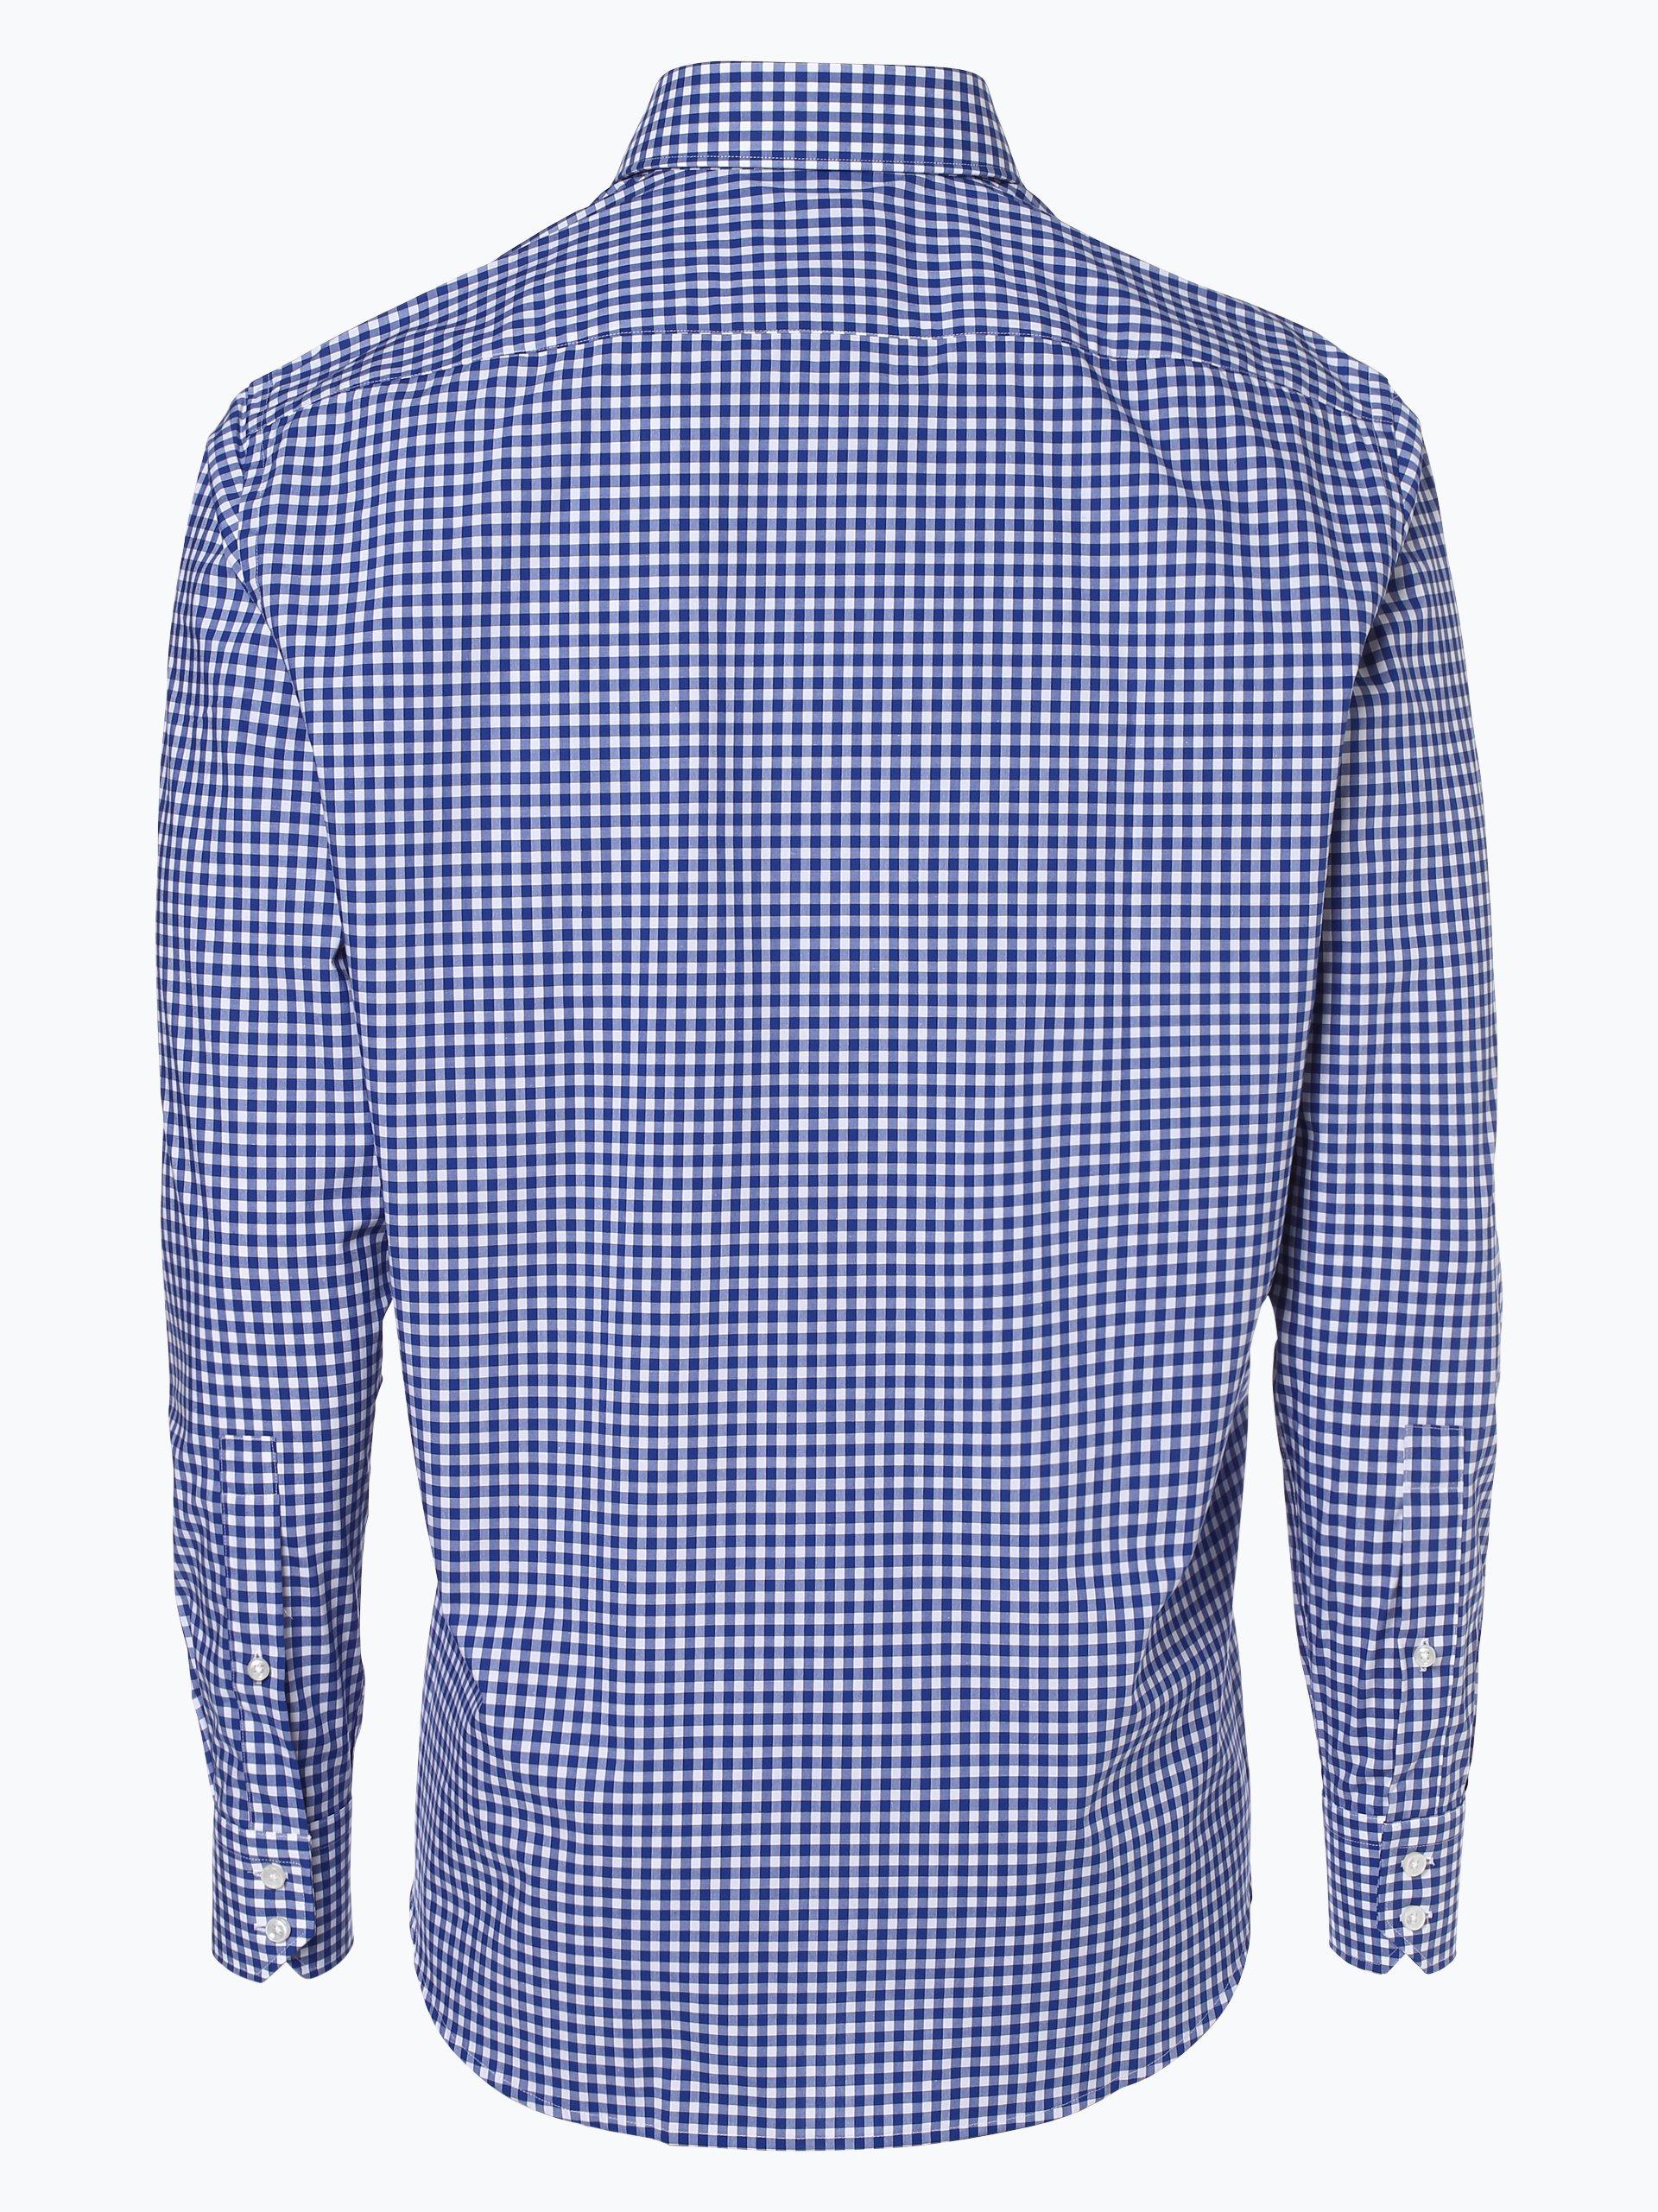 HUGO Herren Hemd Bügelleicht - C-Gordon